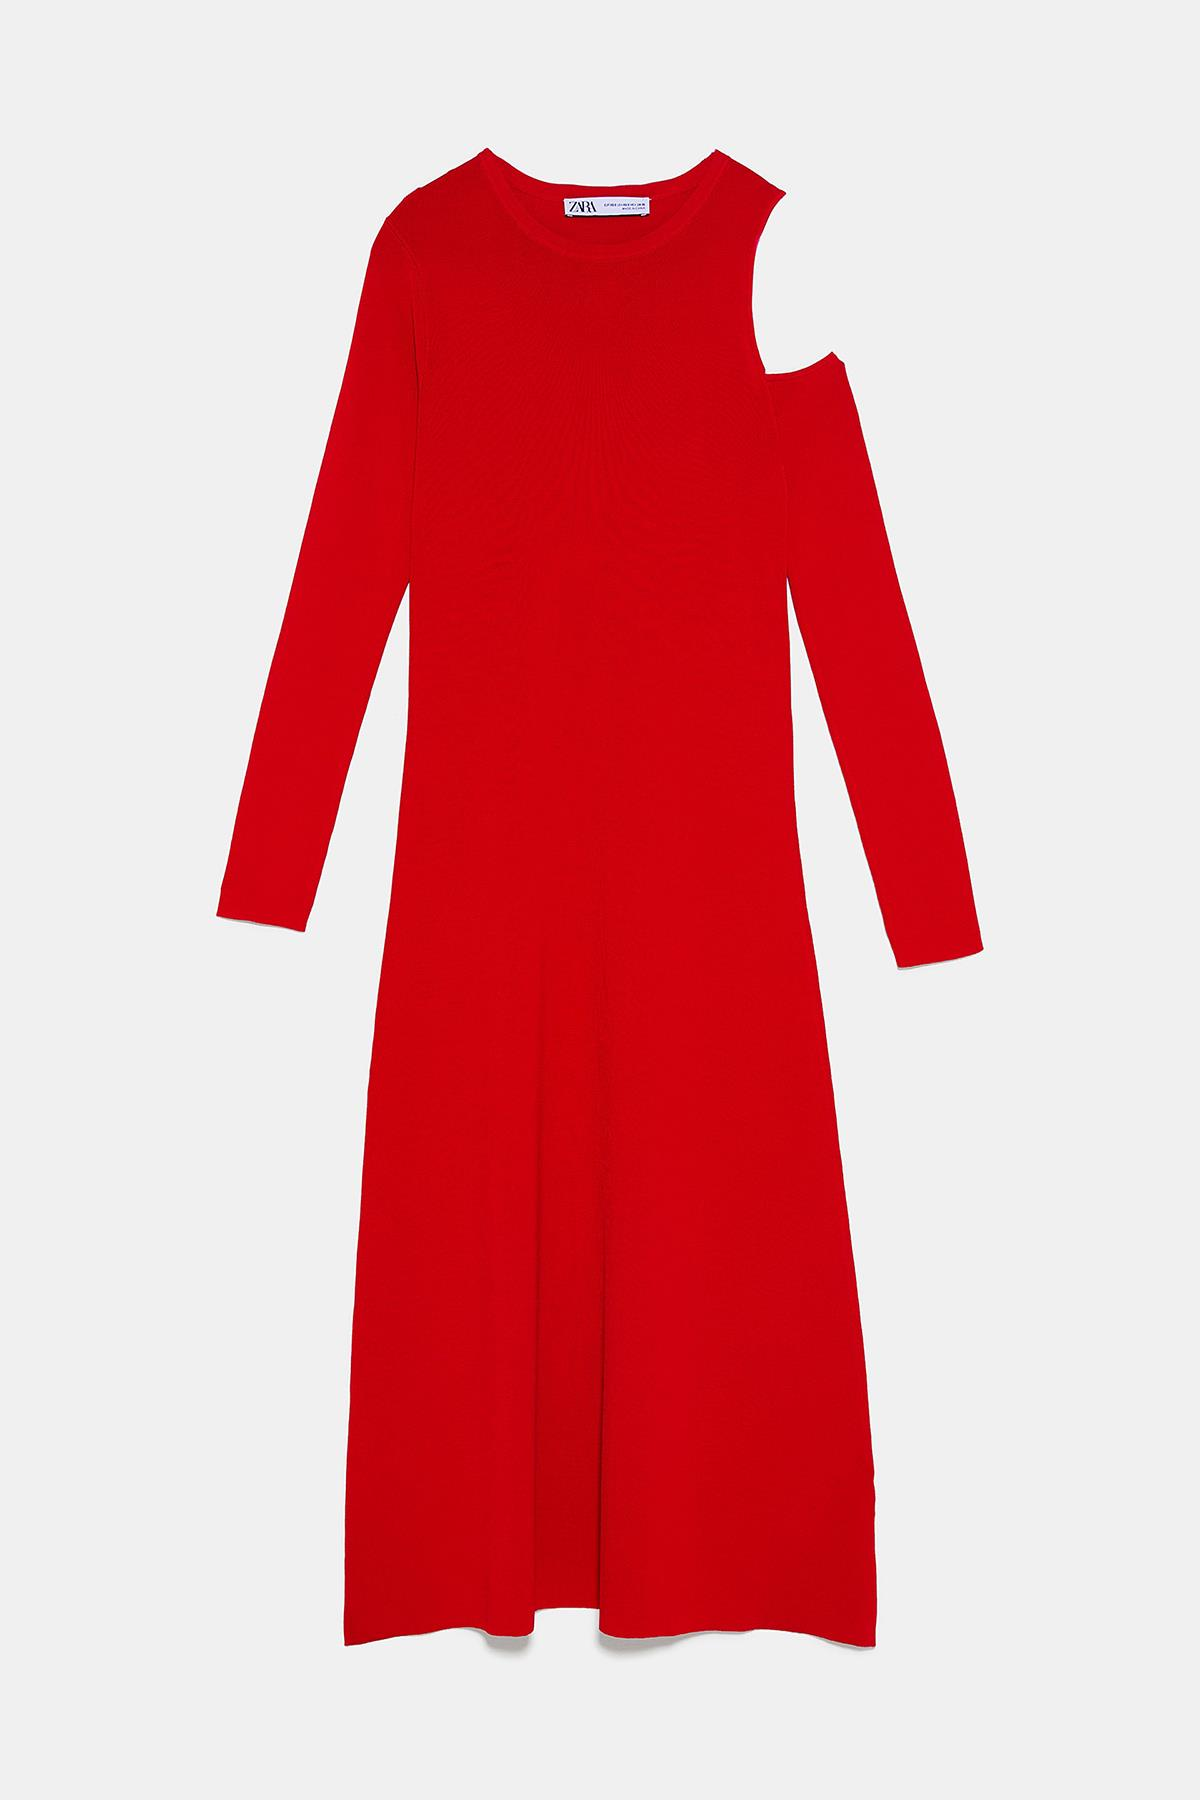 Vestido rojo largo zara 2019